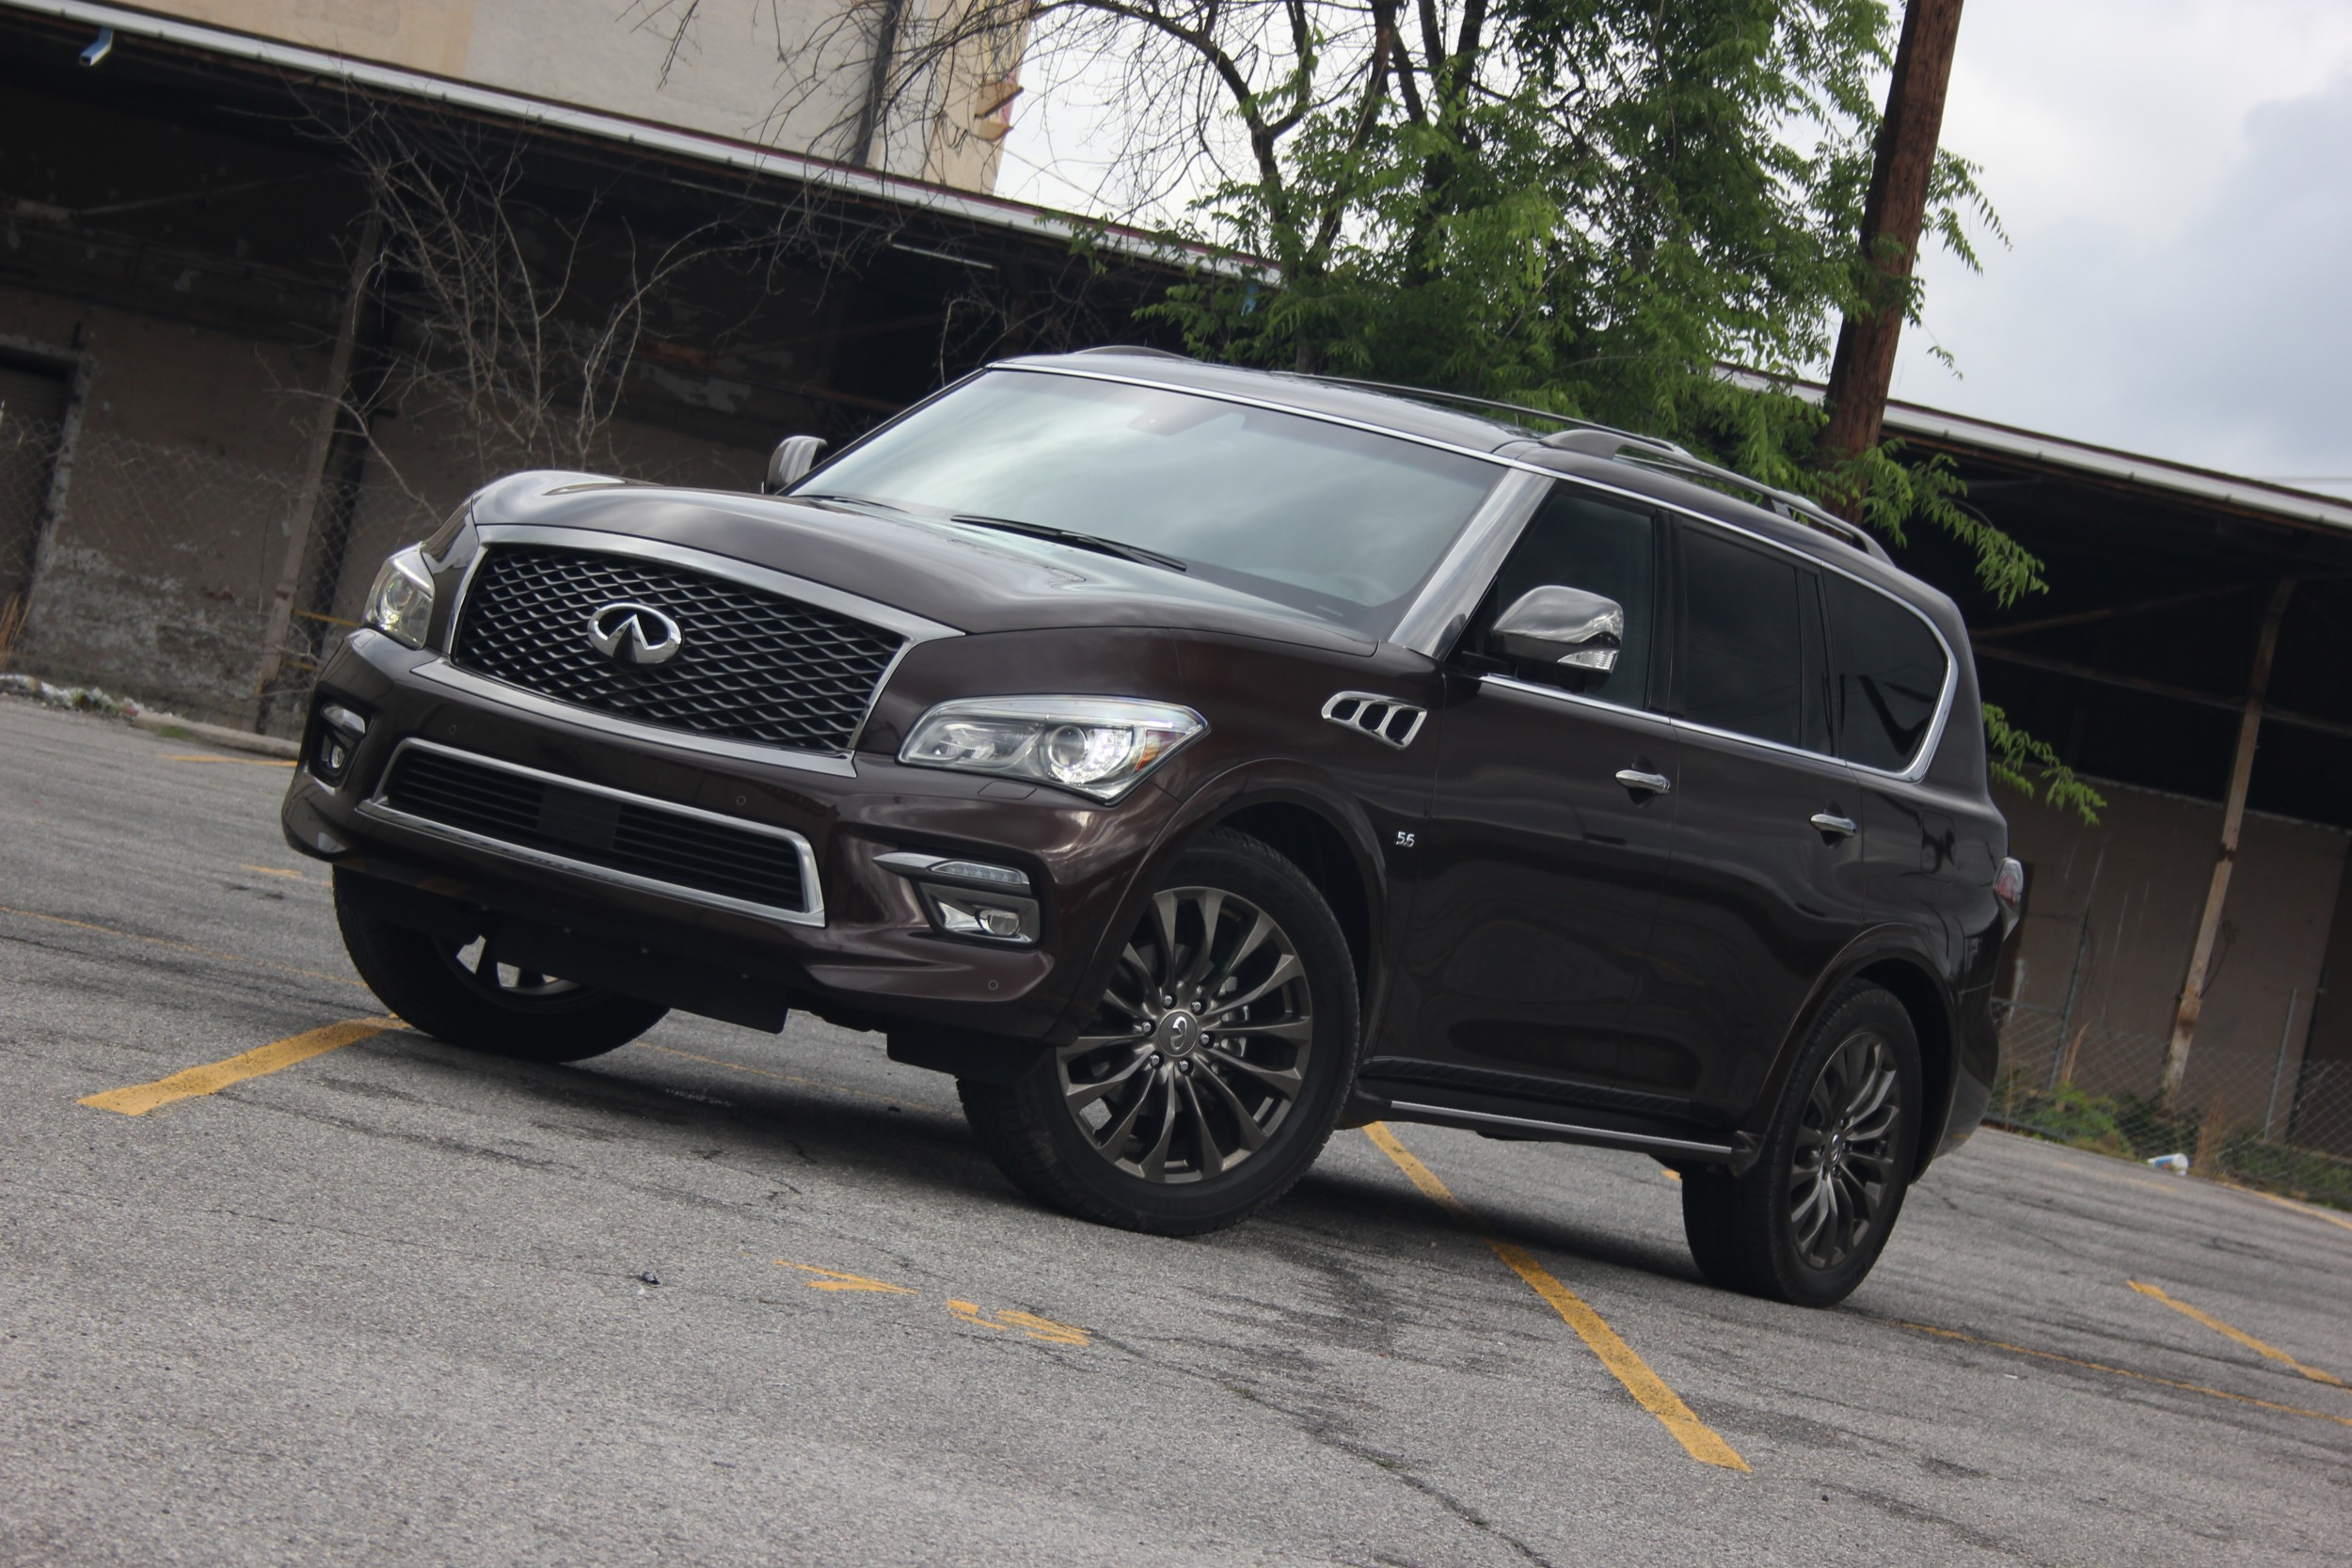 american kmc slide vehicle sale for gmc infinity week customers infiniti gallery yukon with blog wheels ending april